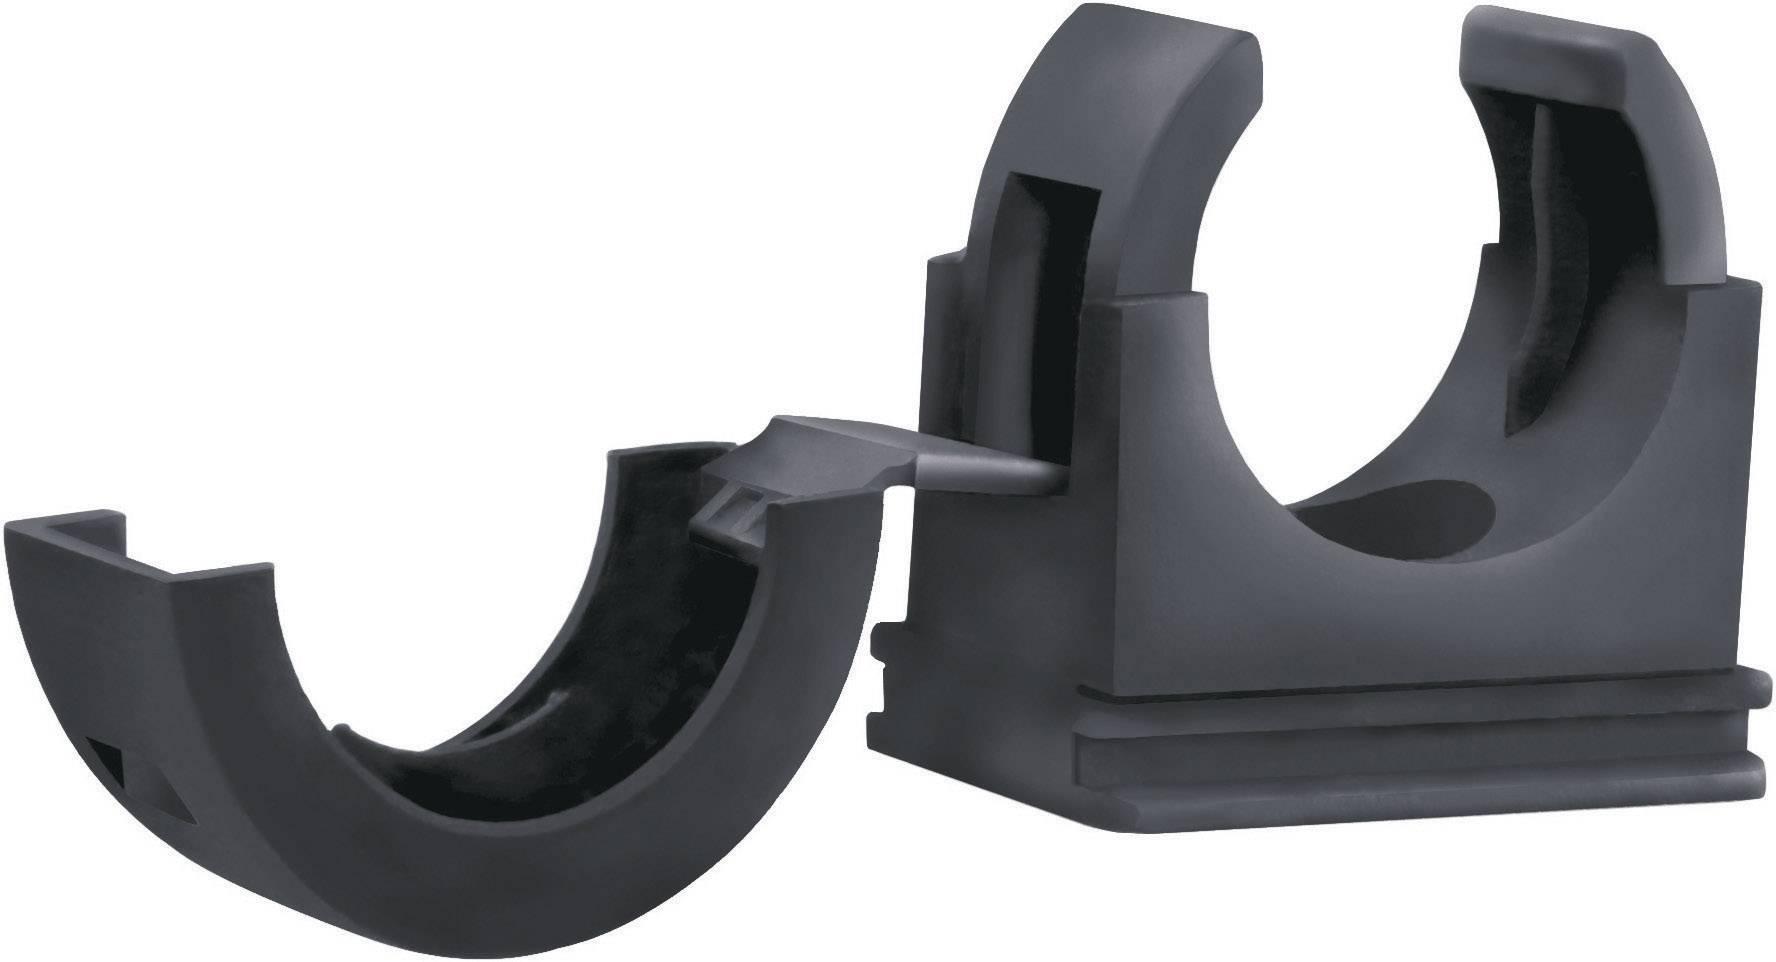 Držák hadice LAPP SILVYN® FCL 20 BK 55507405, 20 mm, černá, 10 ks